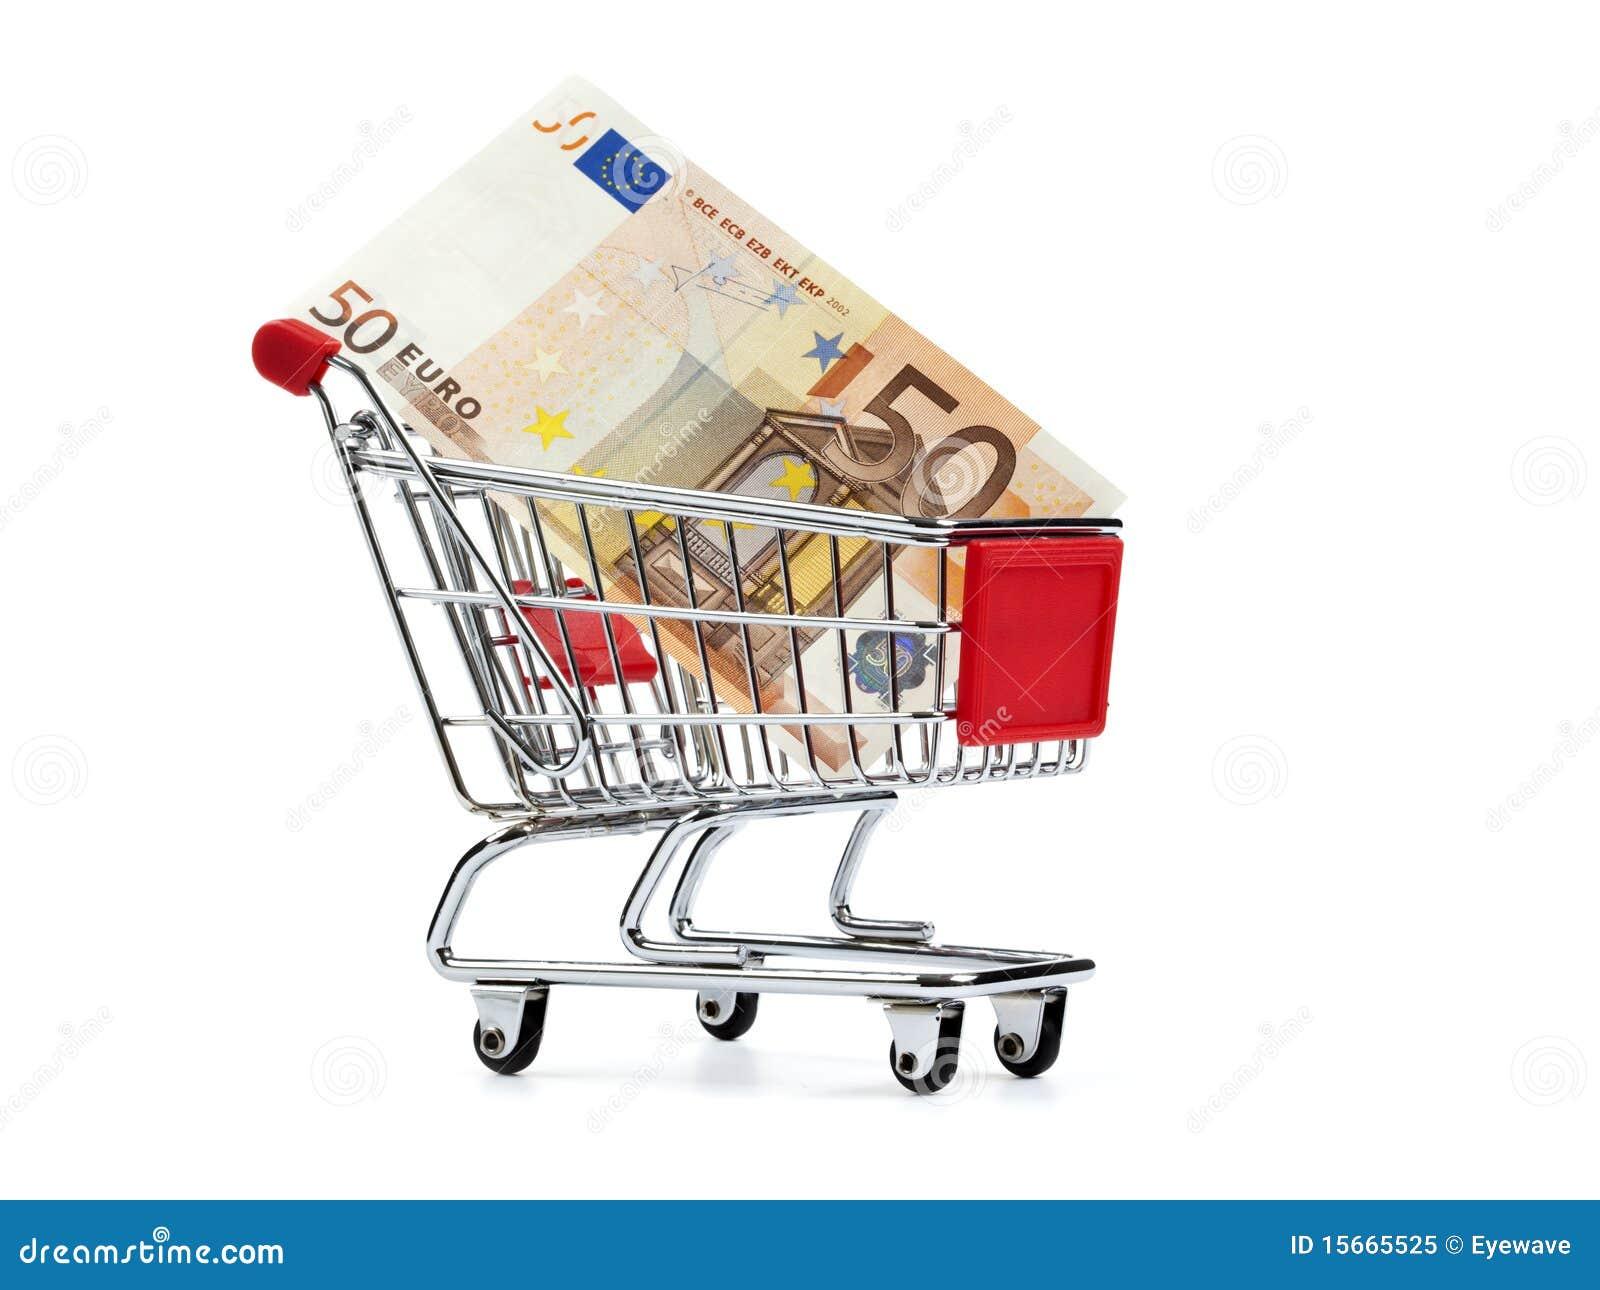 Spending money royalty free stock photo image 15665525 - Shopping cash card paying spending ...